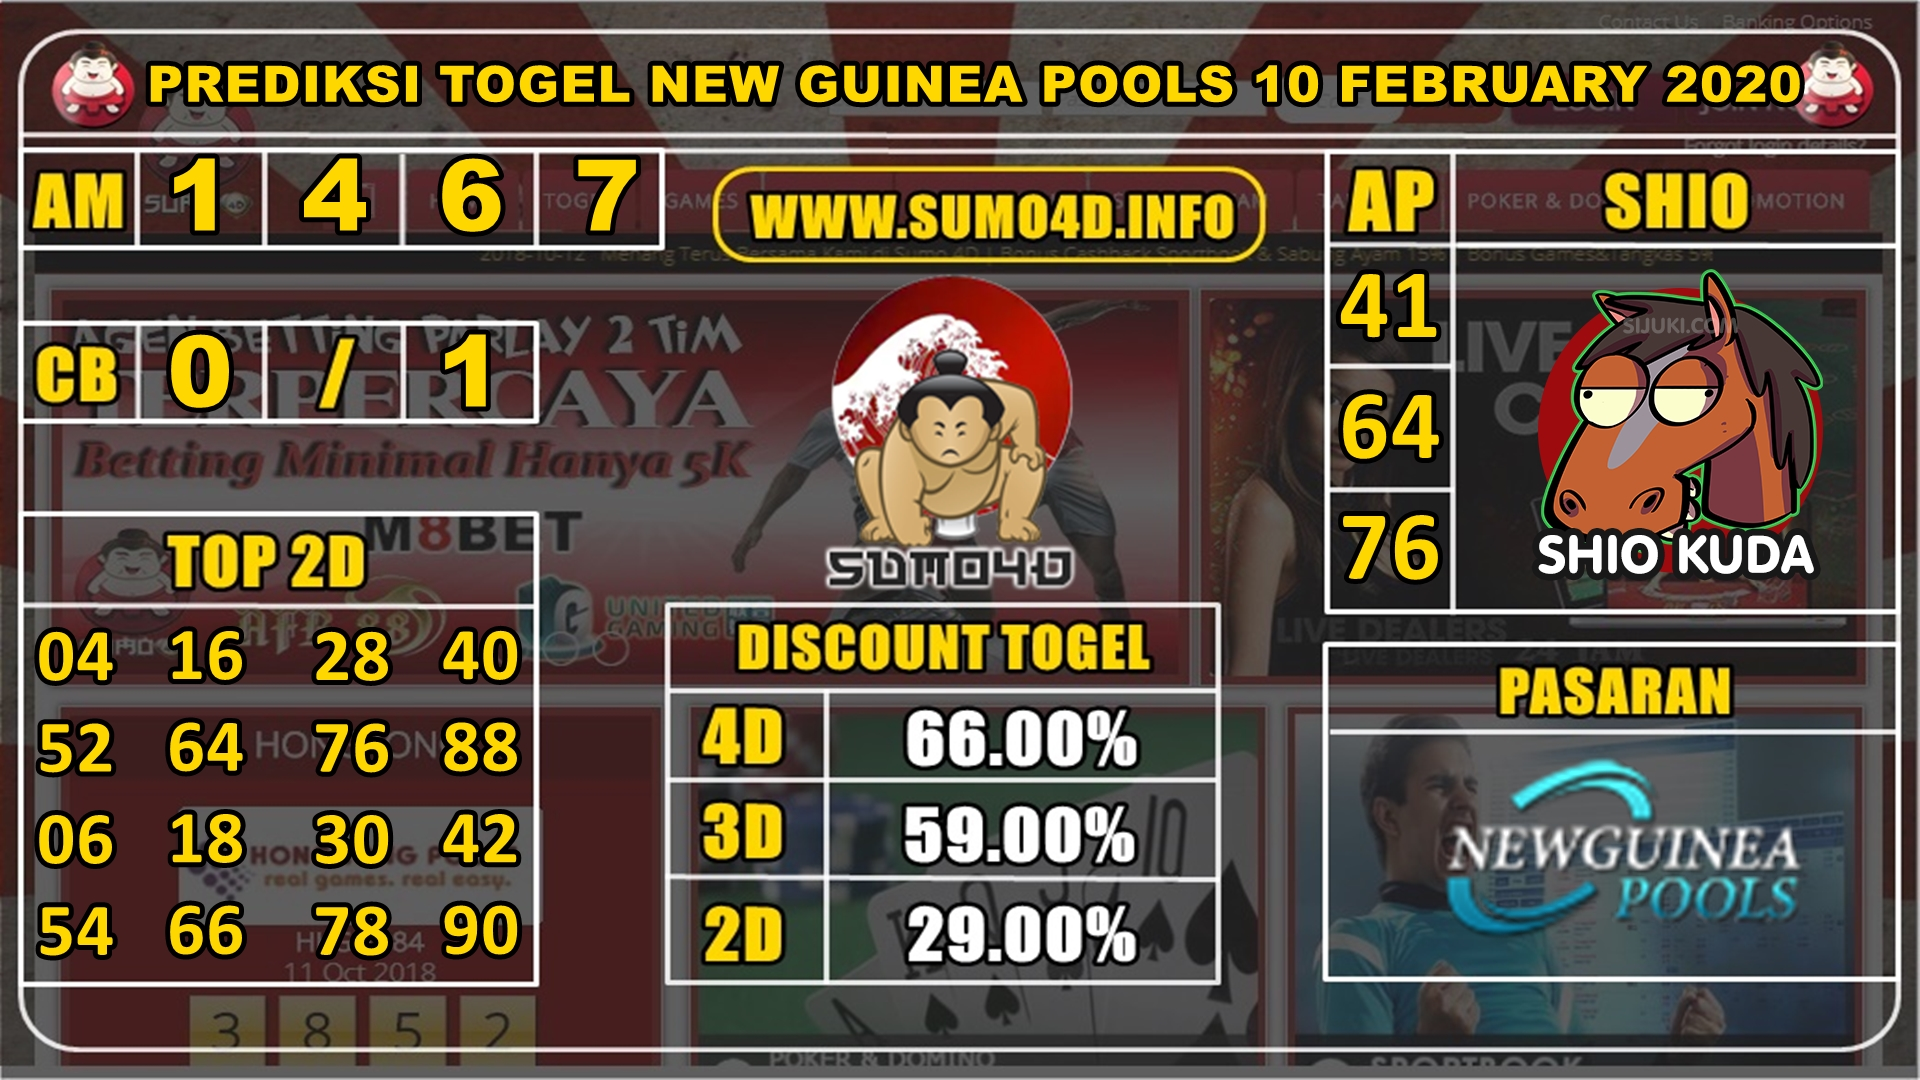 PREDIKSI TOGEL NEW GUINEA POOLS 10 FEBRUARY 2020